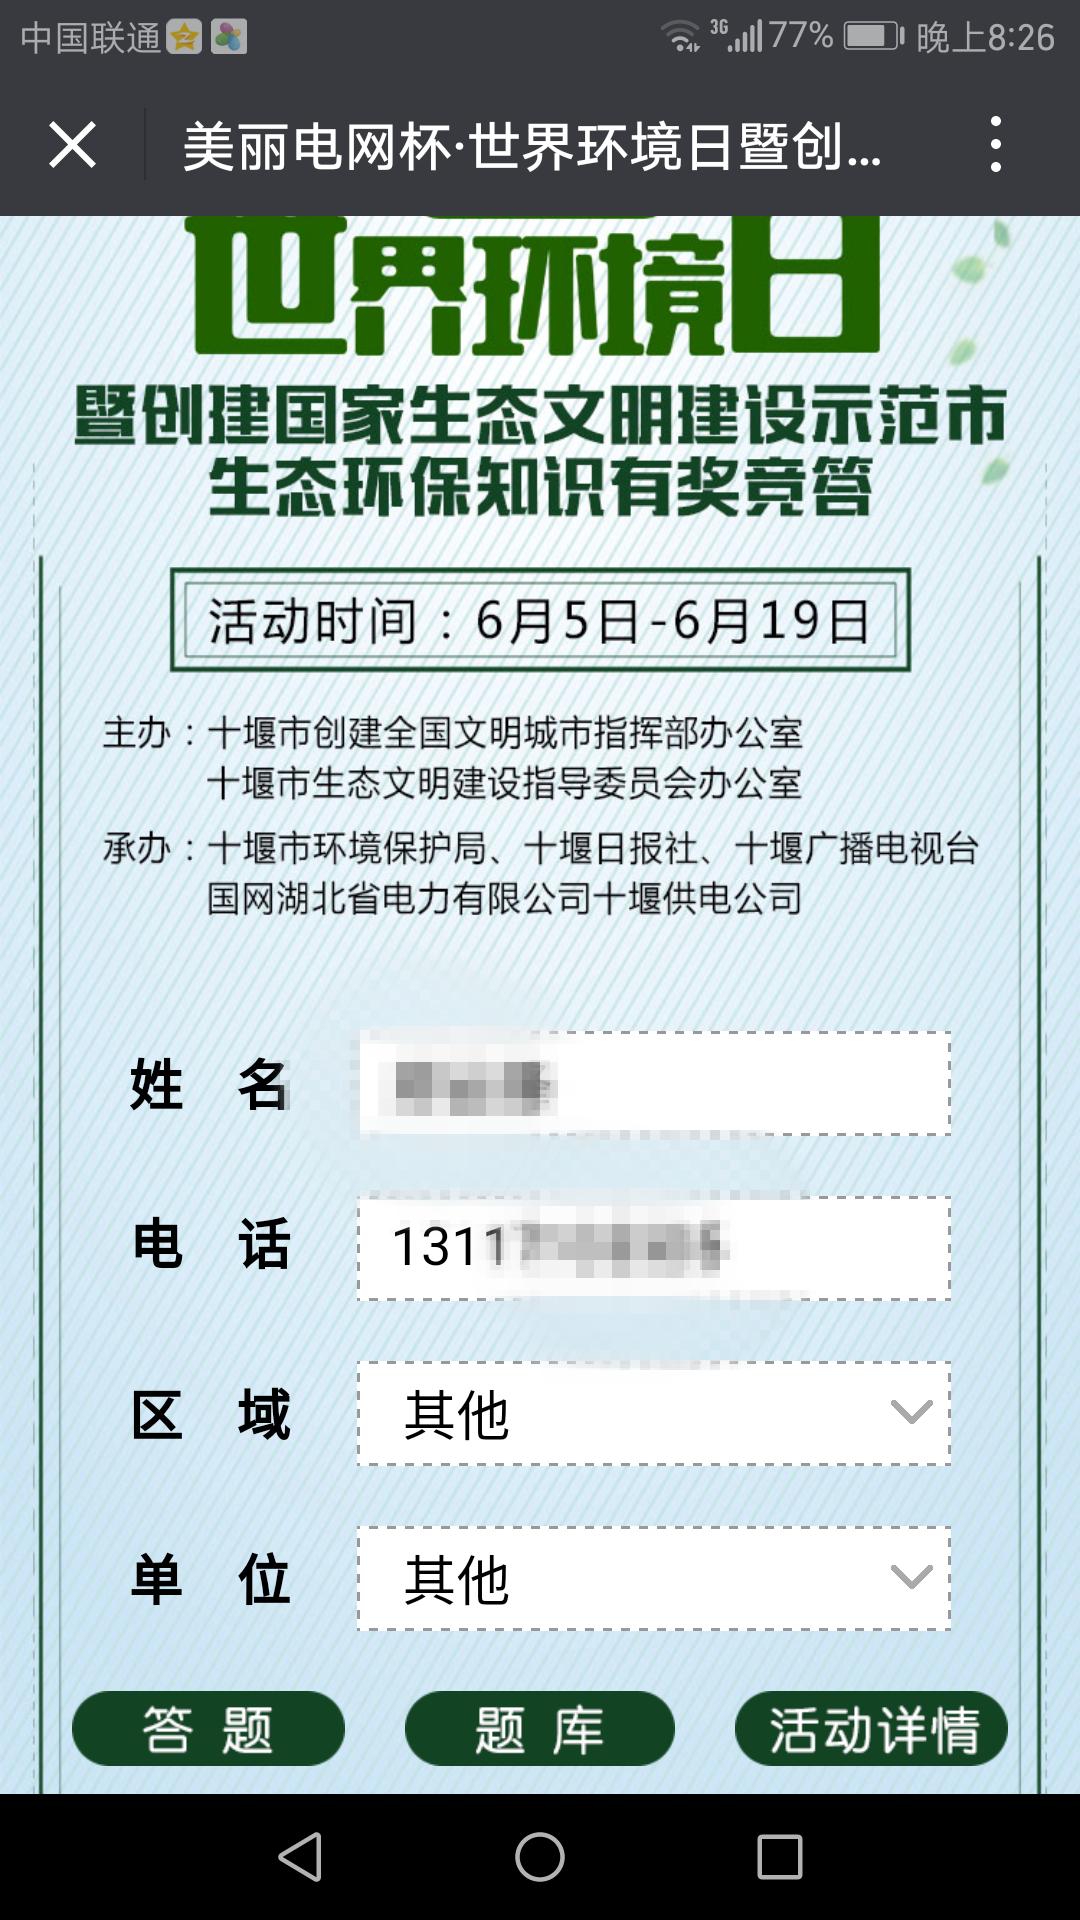 Screenshot_20180605-202607.png